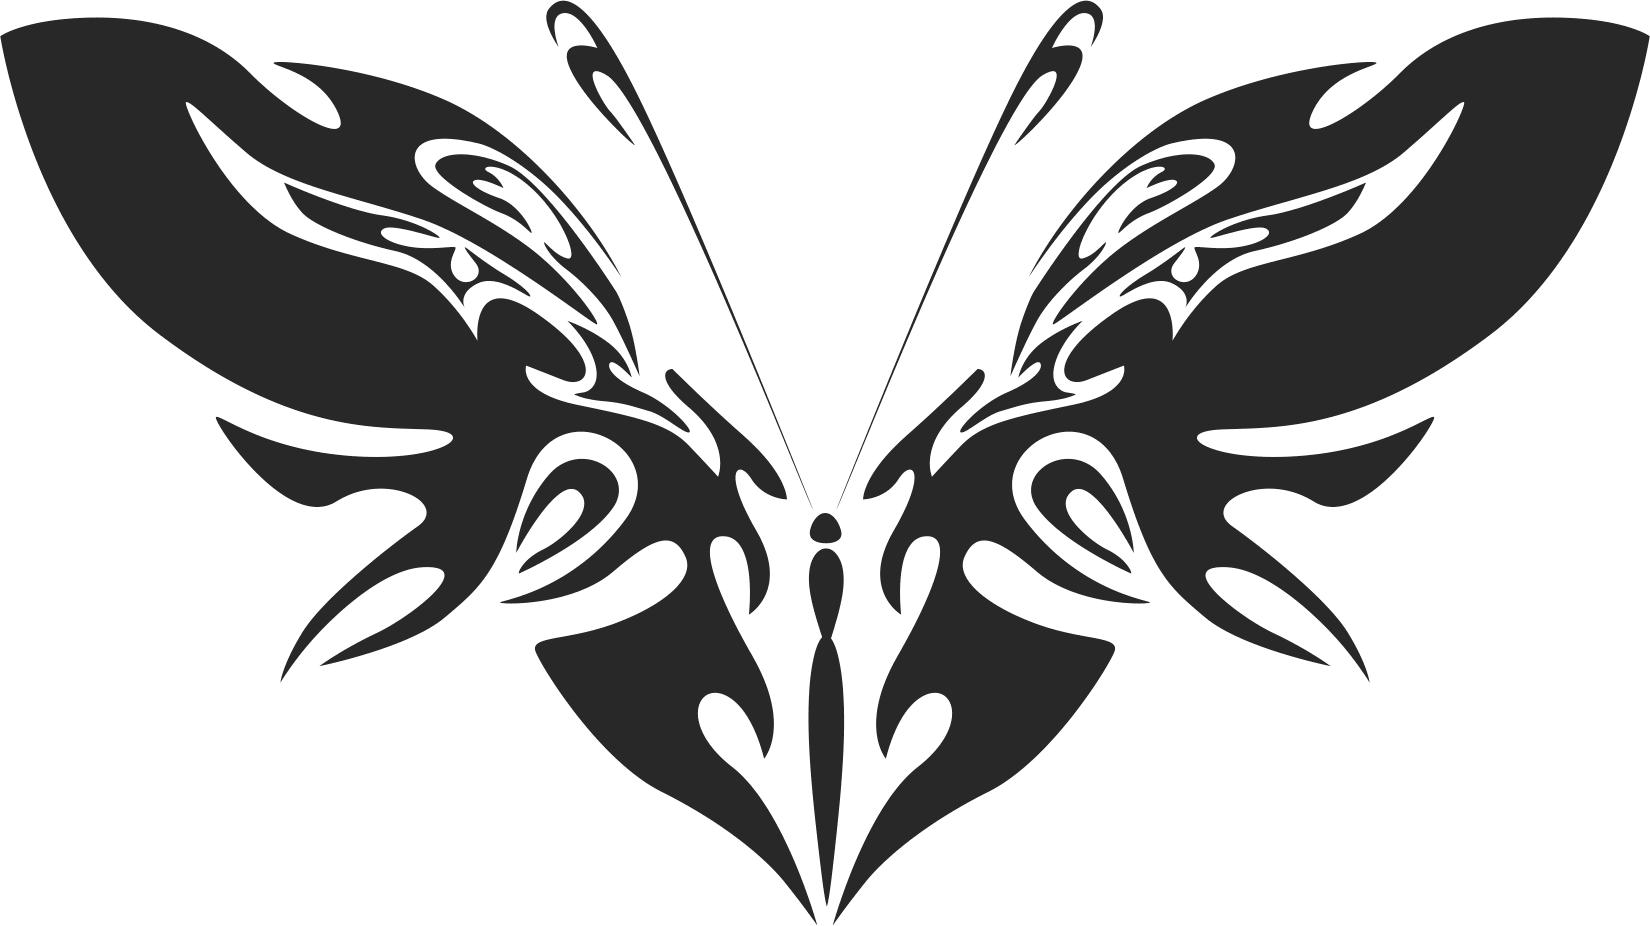 Butterfly Vector Art 042 Free CDR Vectors Art